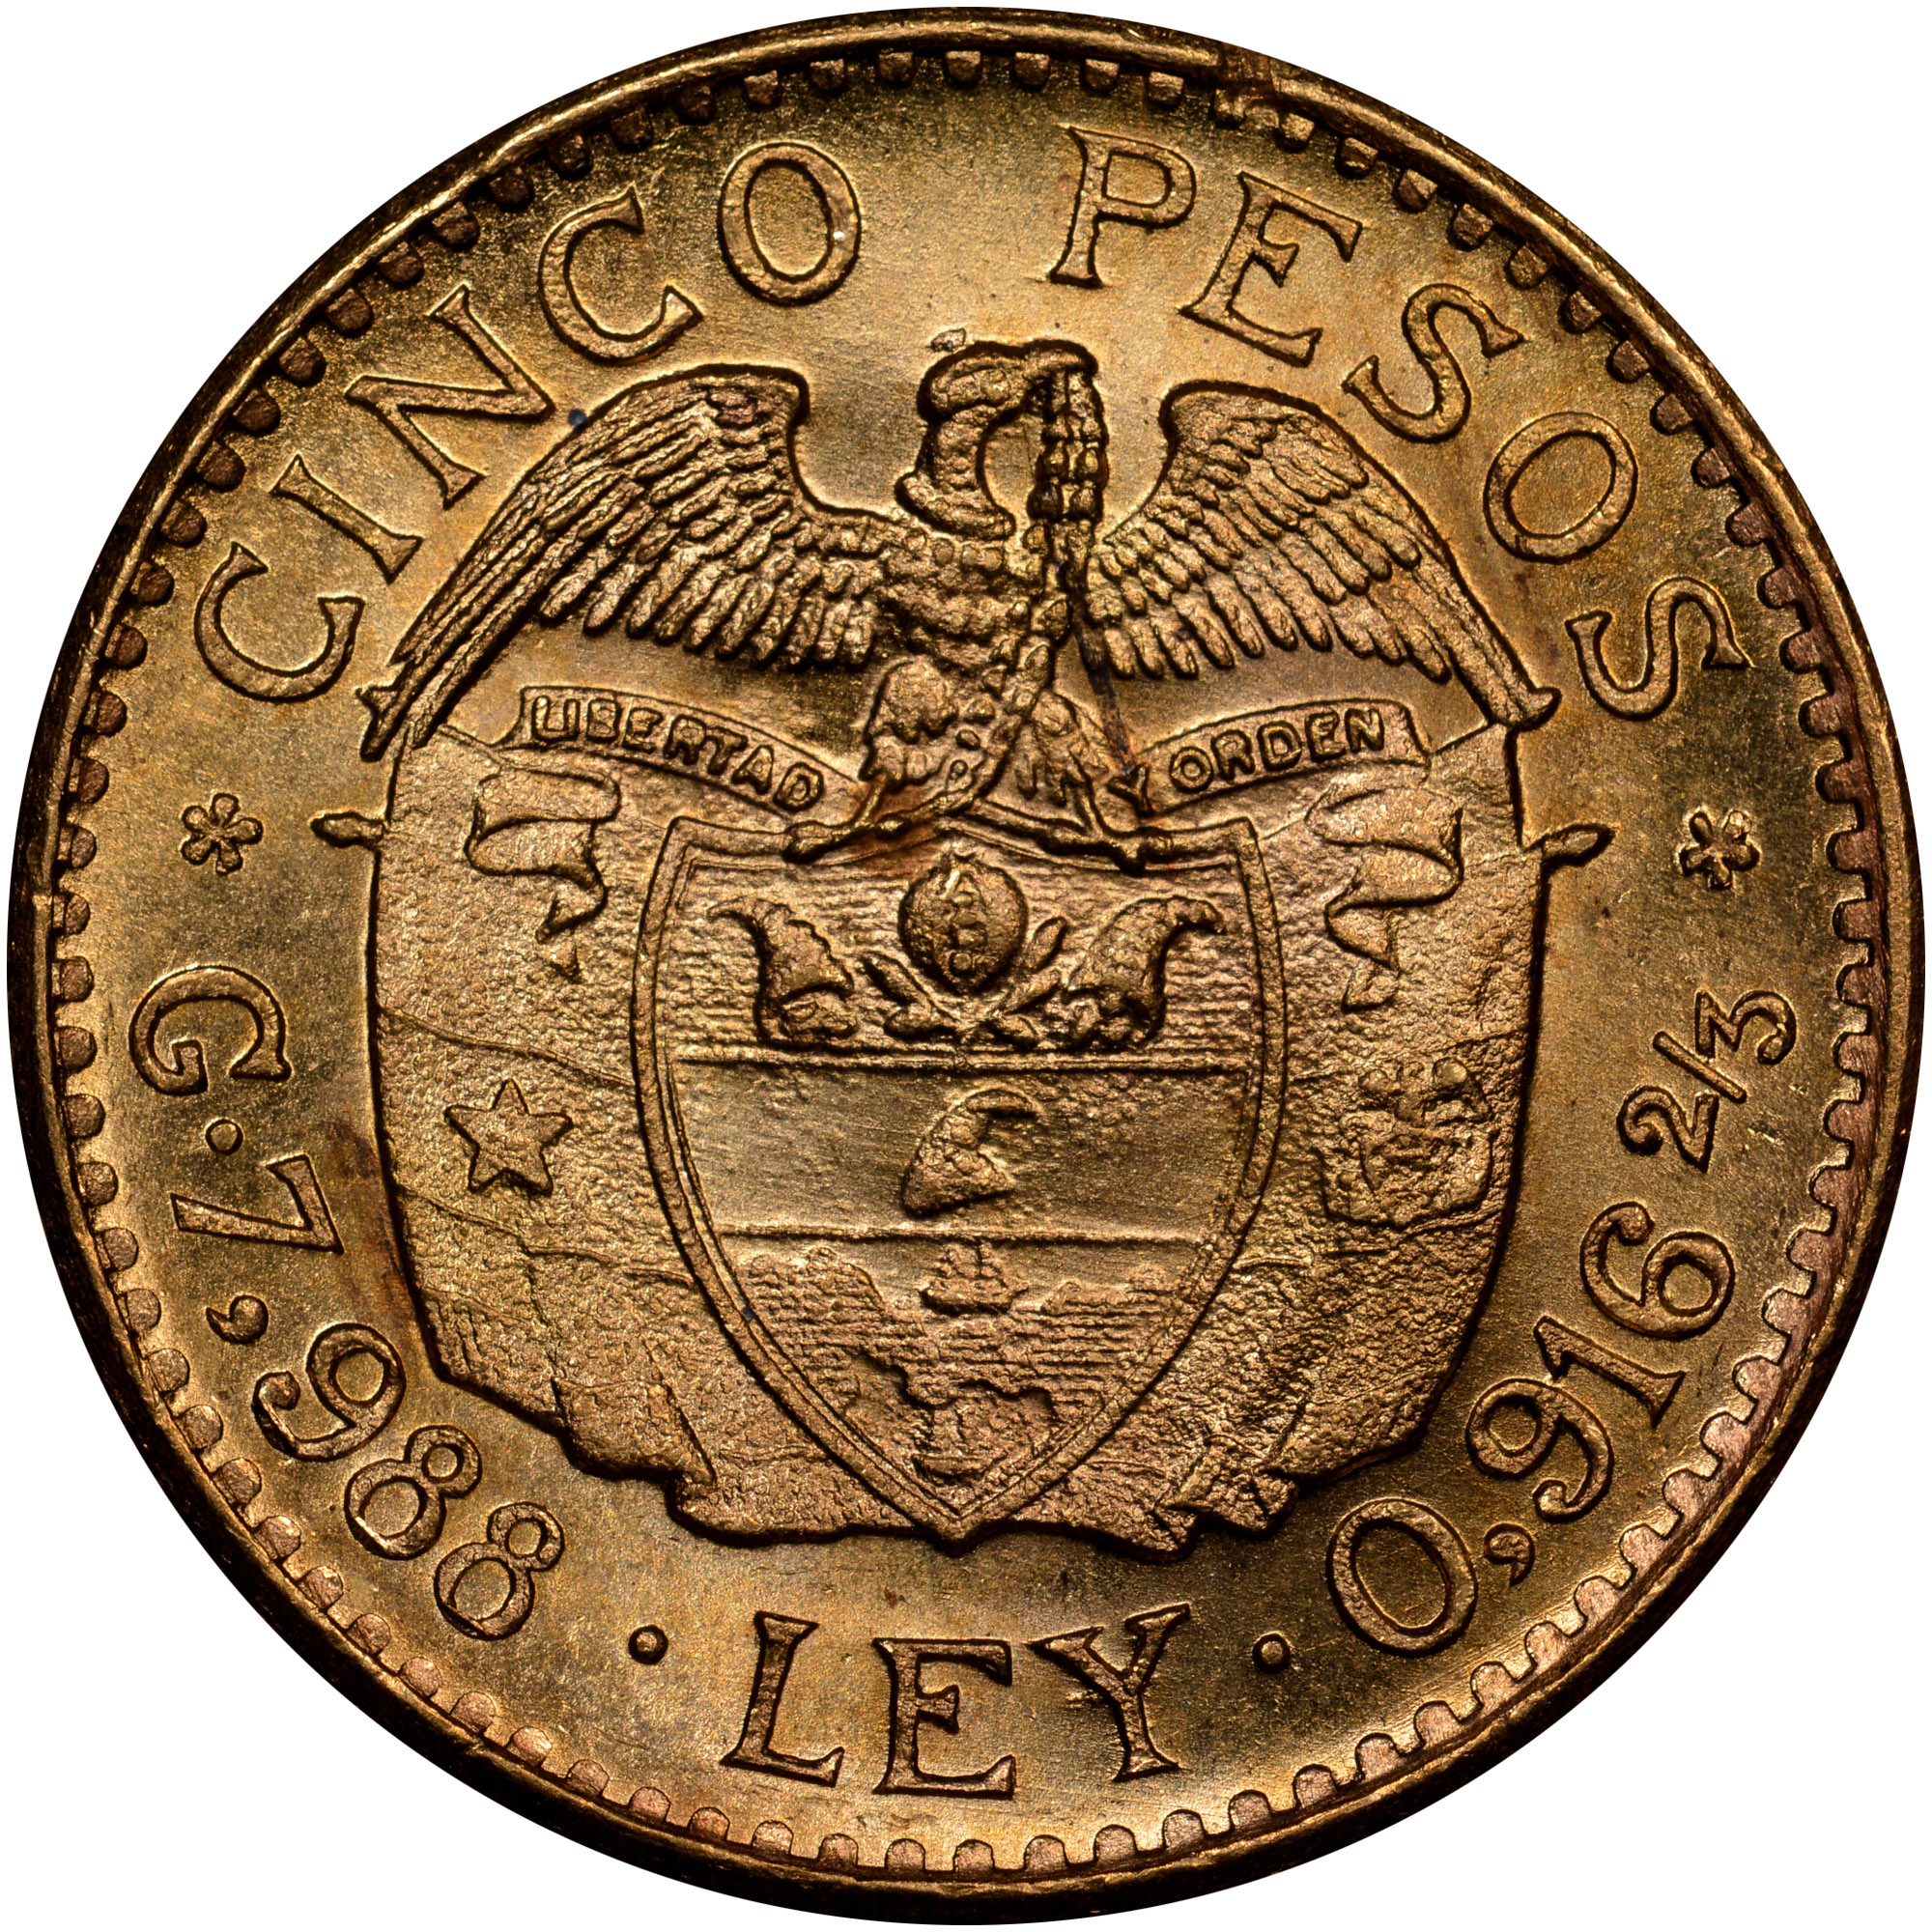 1924-1930 Colombia 5 Pesos reverse